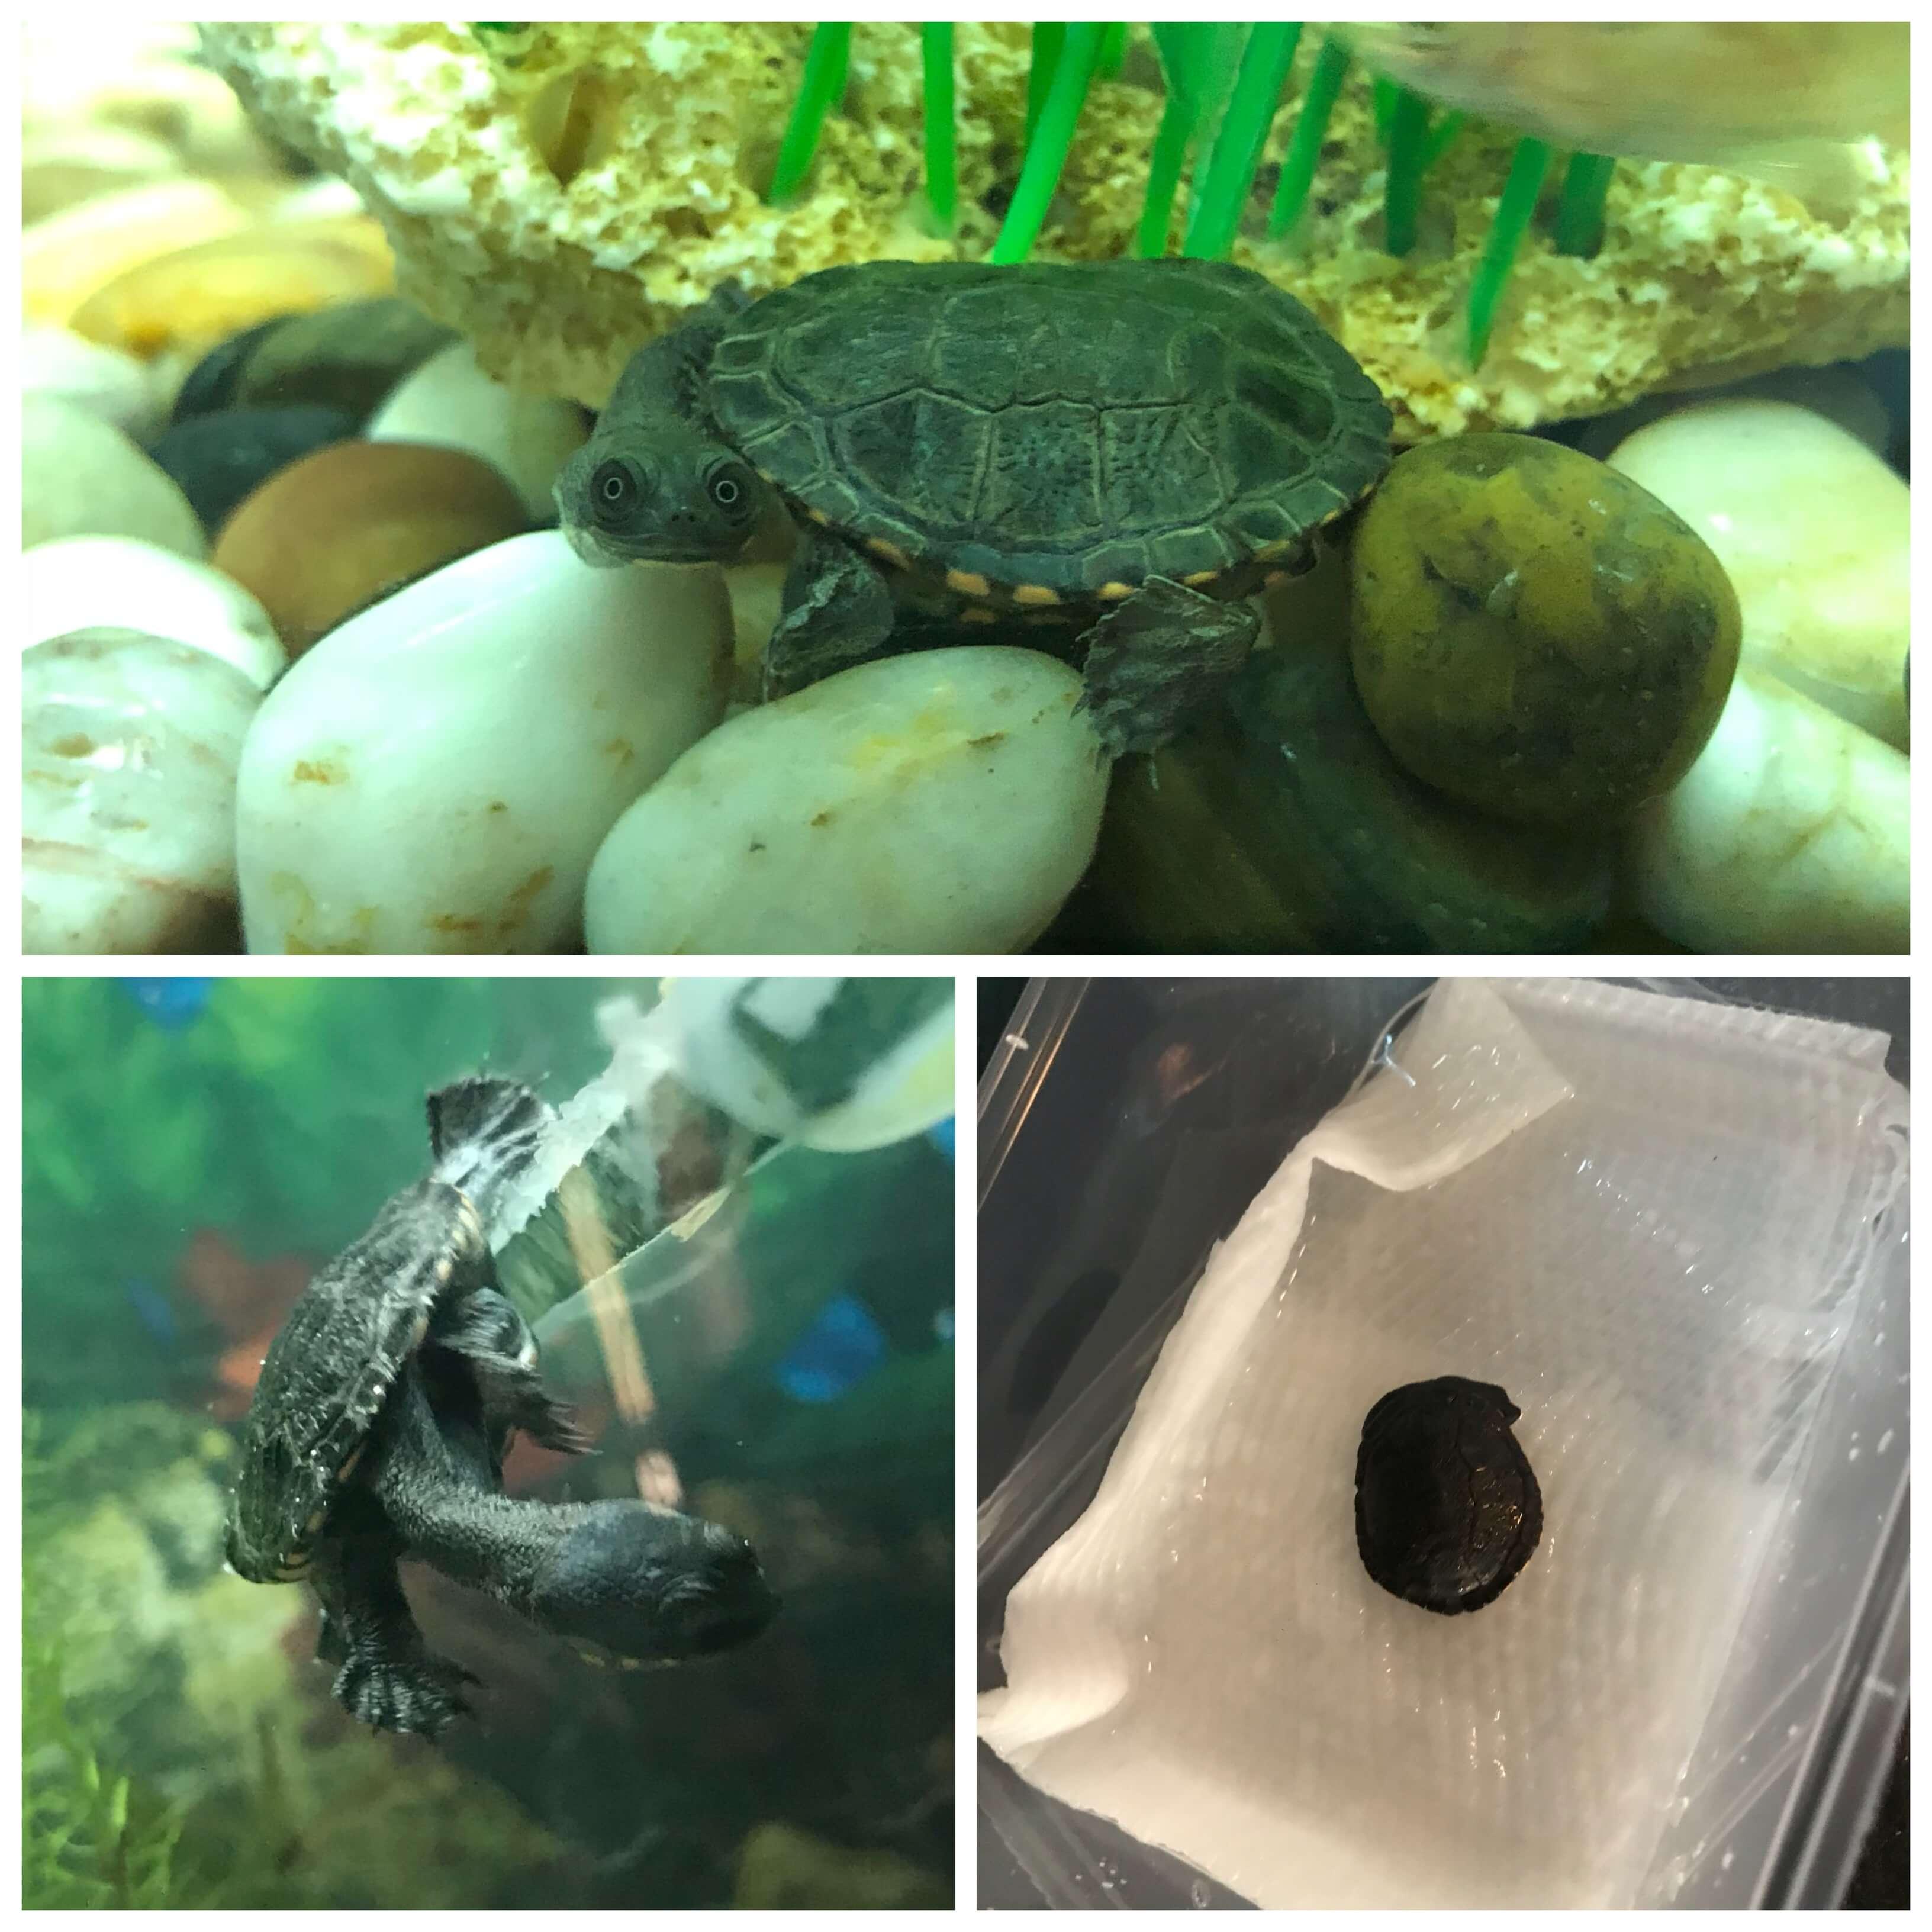 Pretzel the long necked turtle